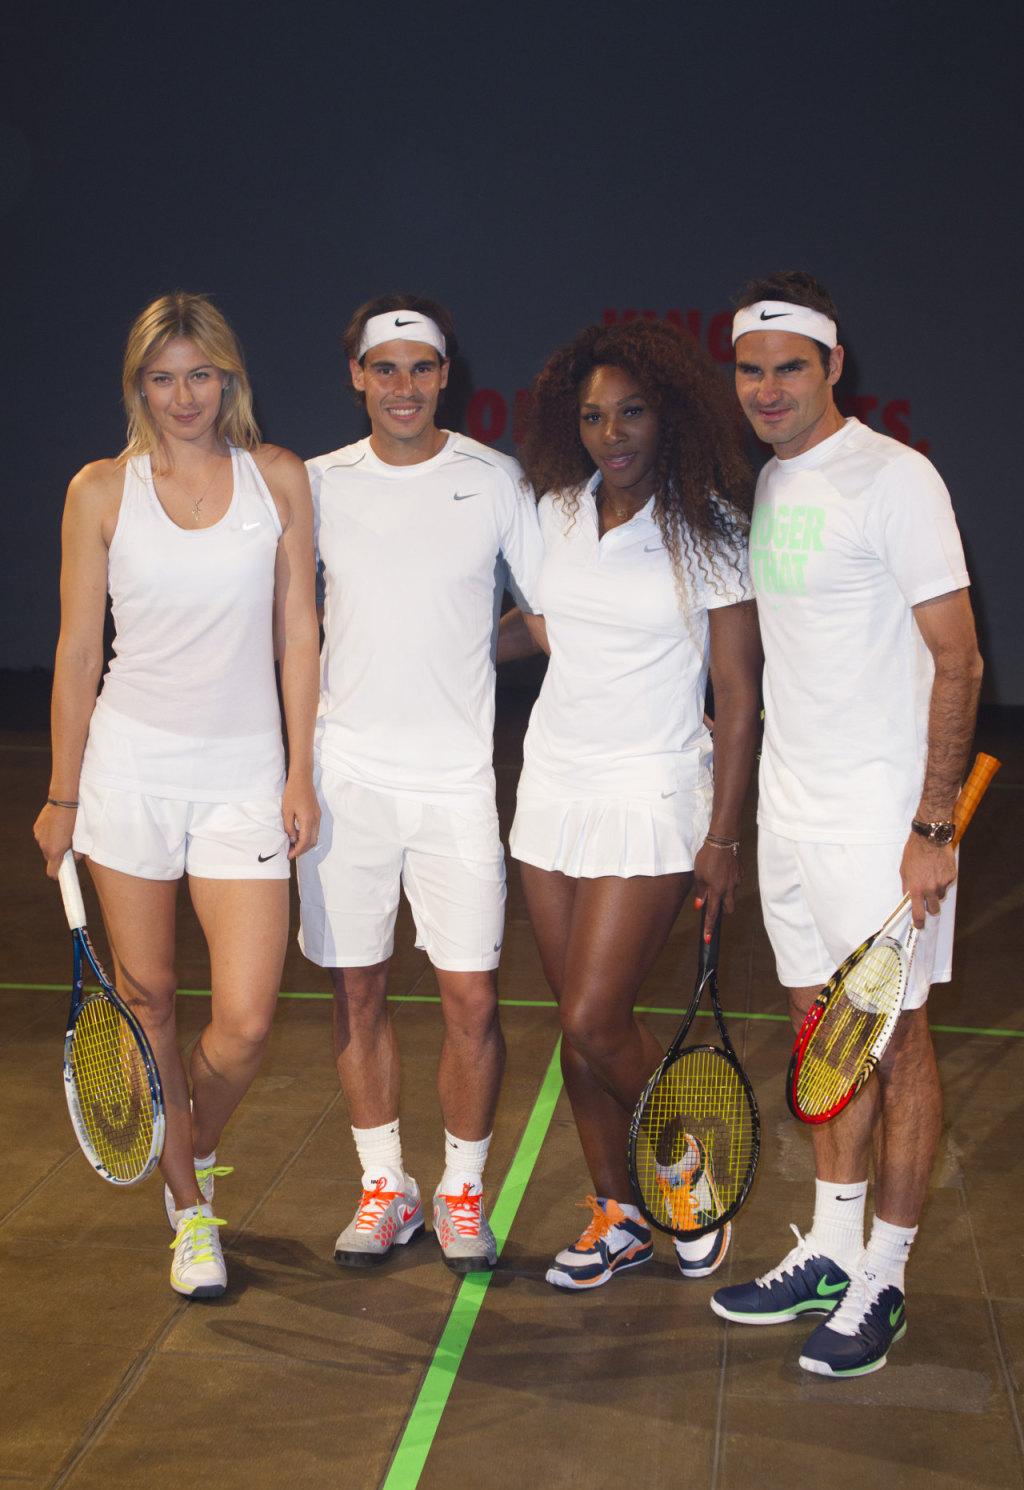 ¿Cuánto mide Serena Williams? - Altura - Real height Maria-Sharapova---Nike-Night-Tennis-mixed-doubles-presentation-in-Malakoff--03